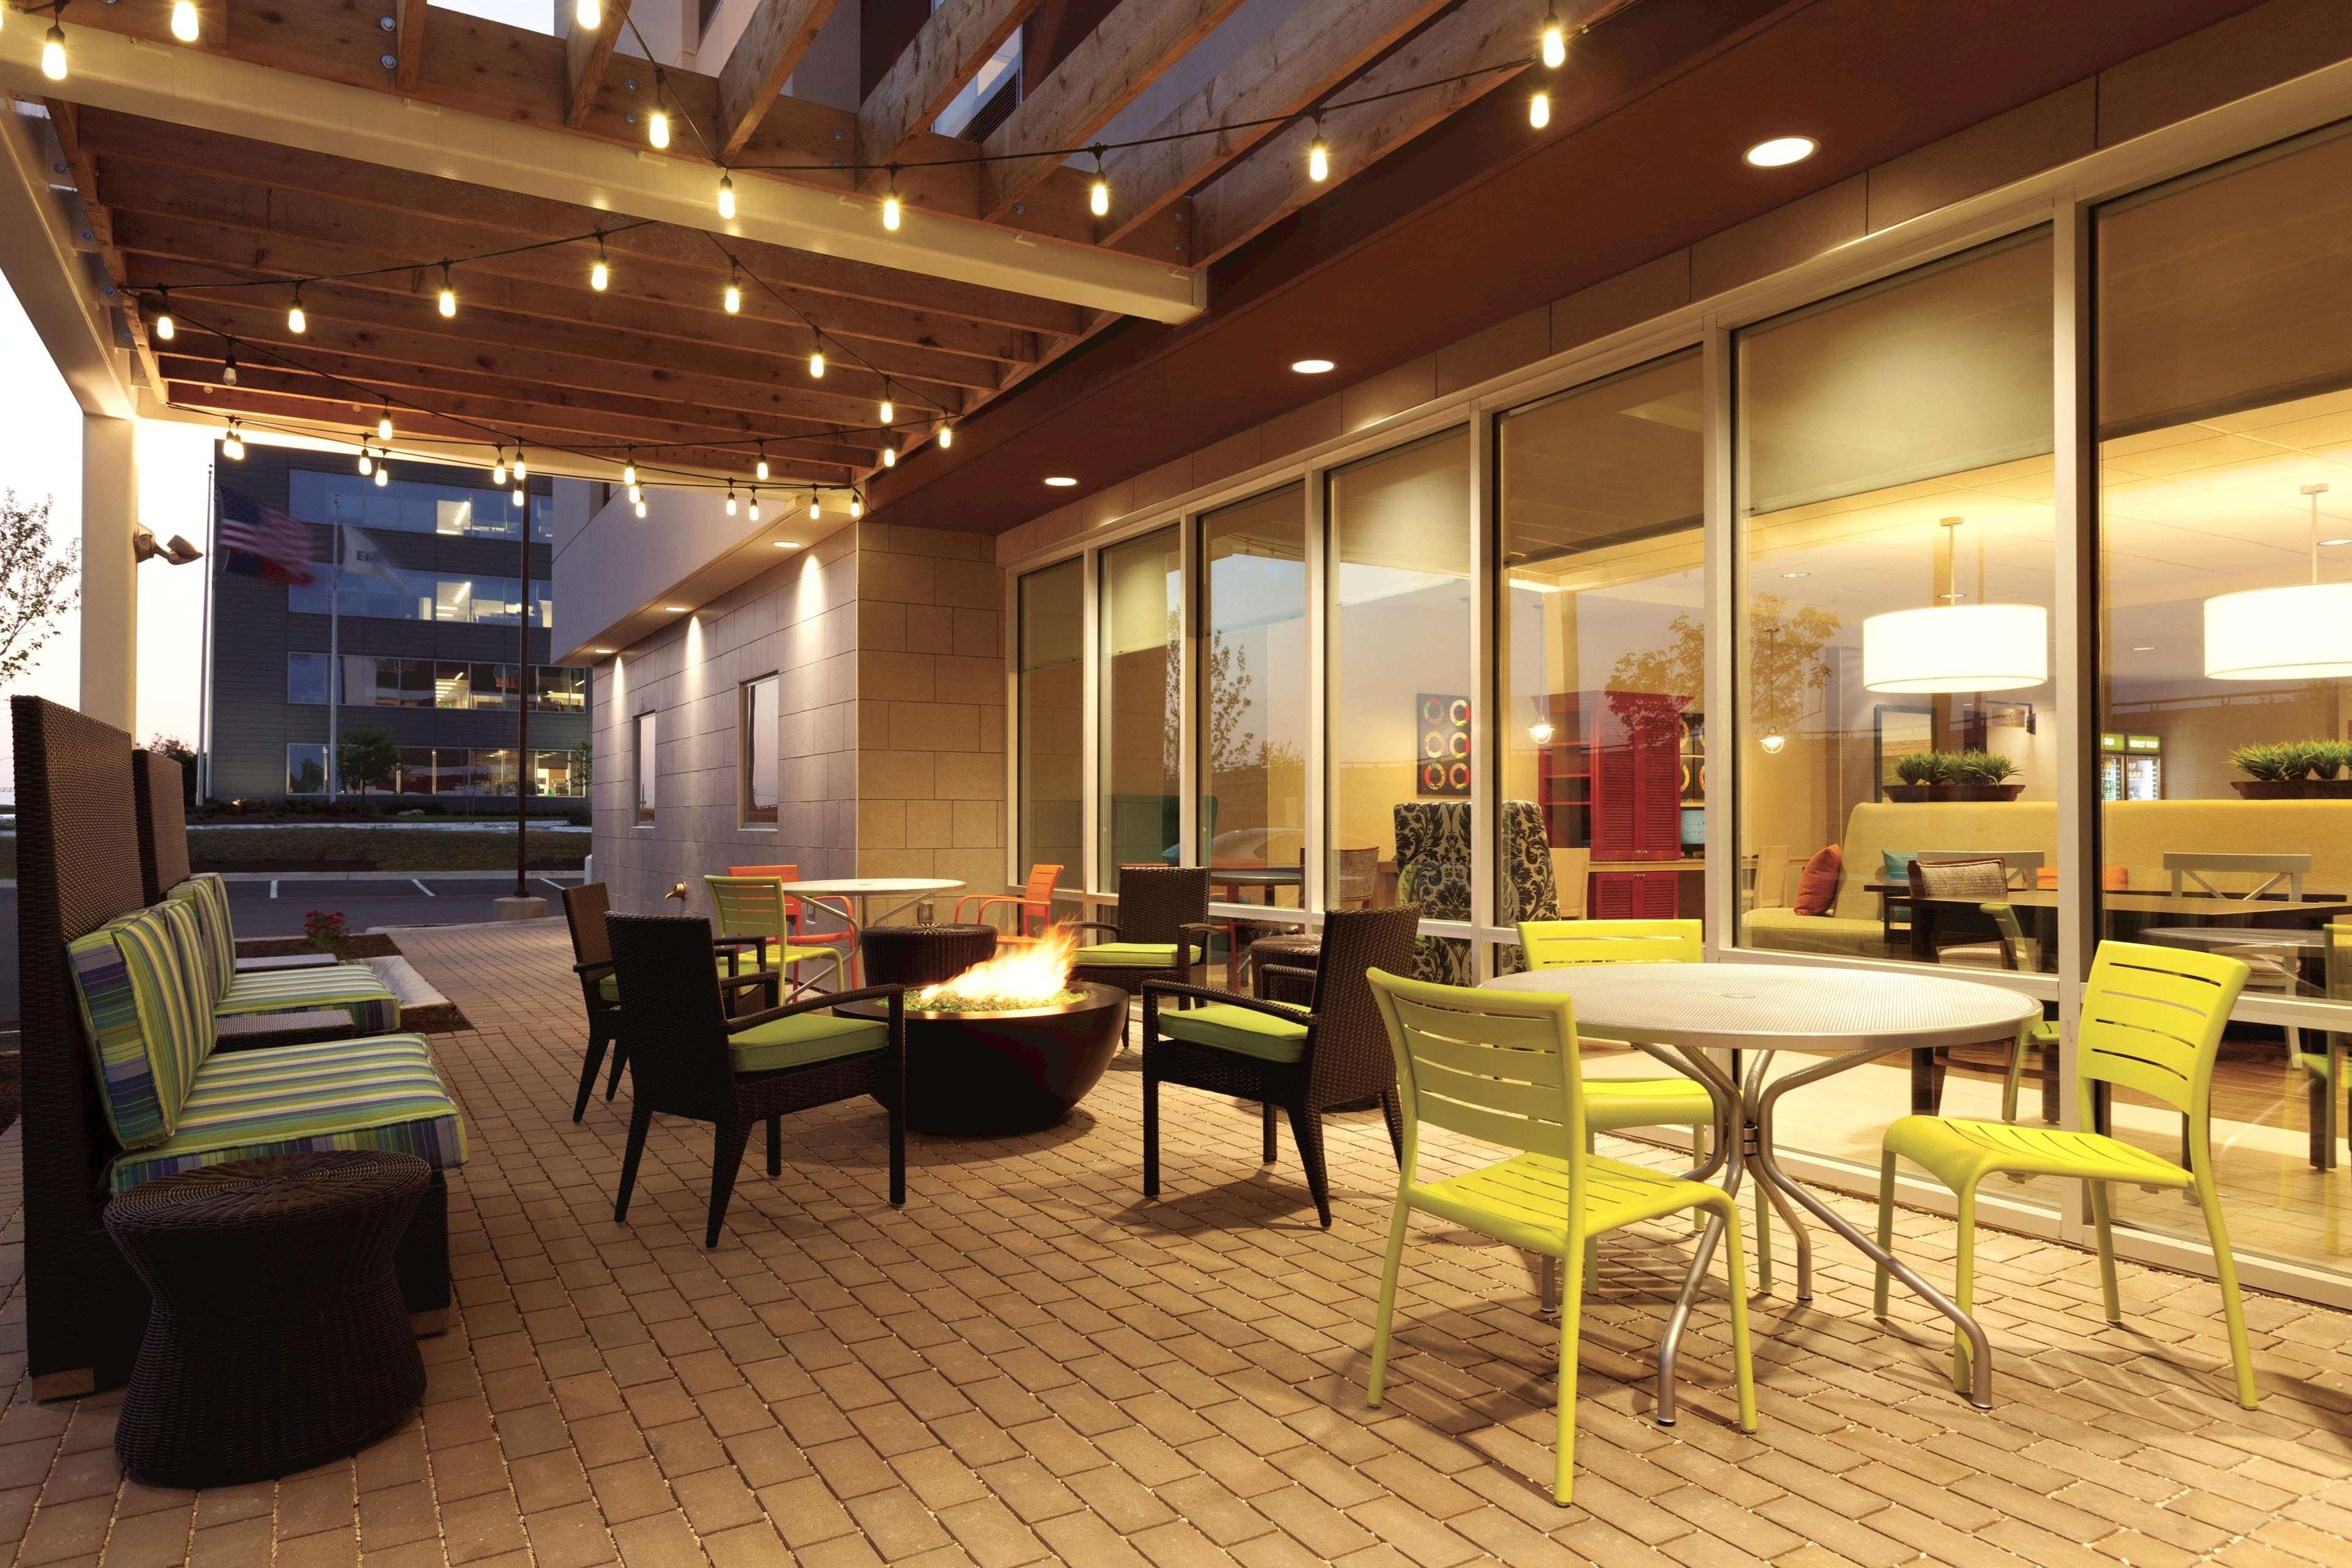 Home2 Suites by Hilton Austin Round Rock image 19